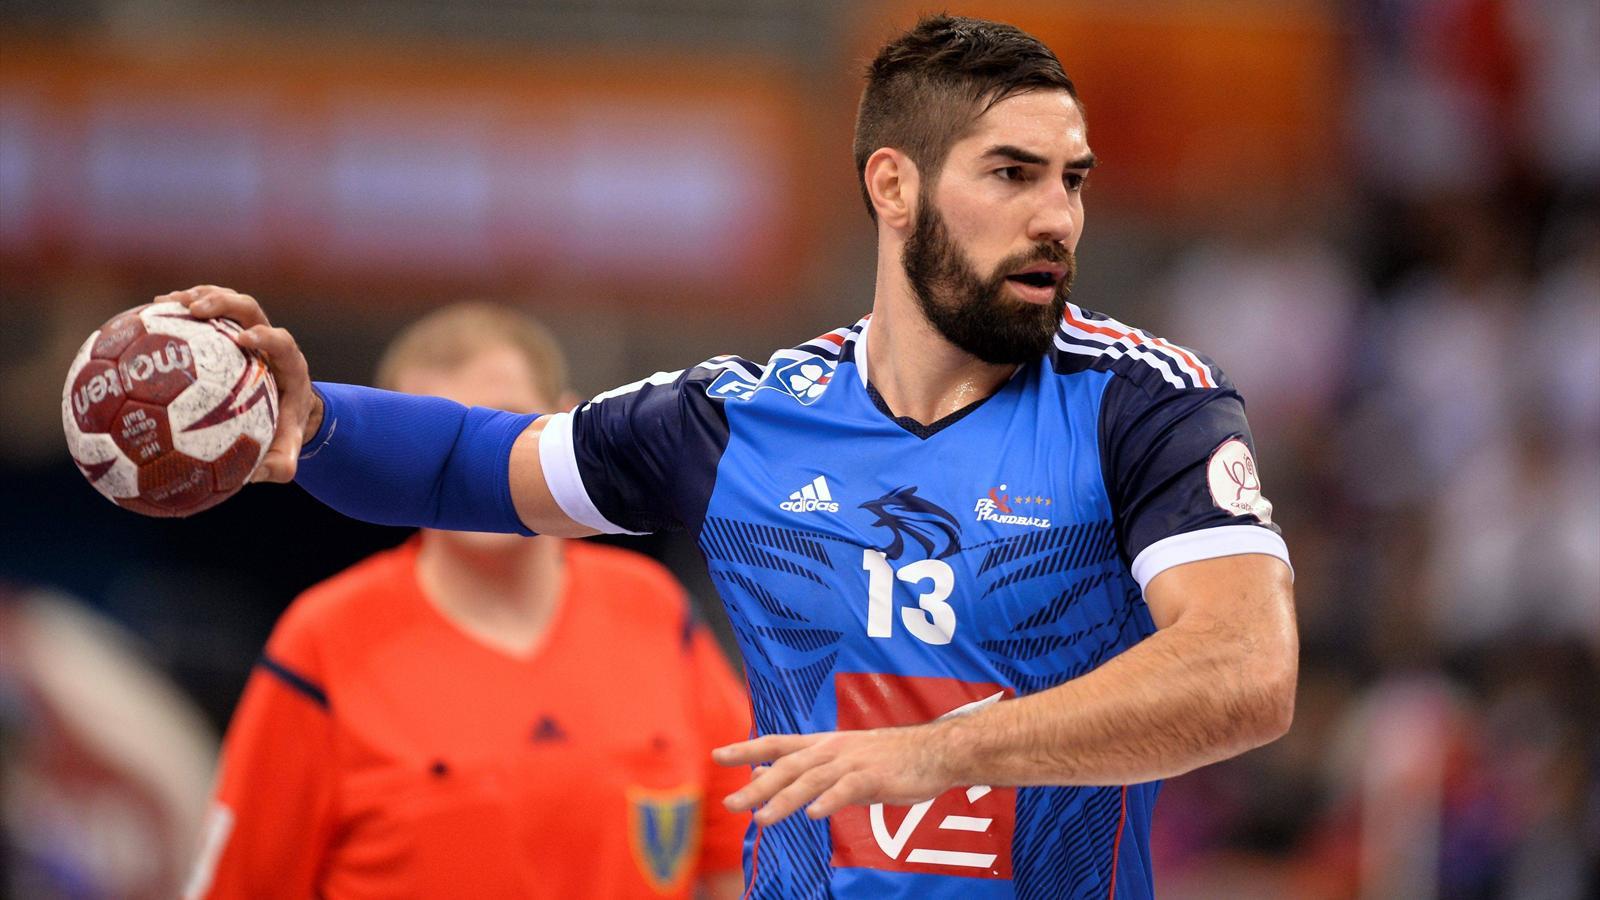 Hand nikola karabatic indisponible plusieurs semaines - Coupe du monde de handball 2015 calendrier ...